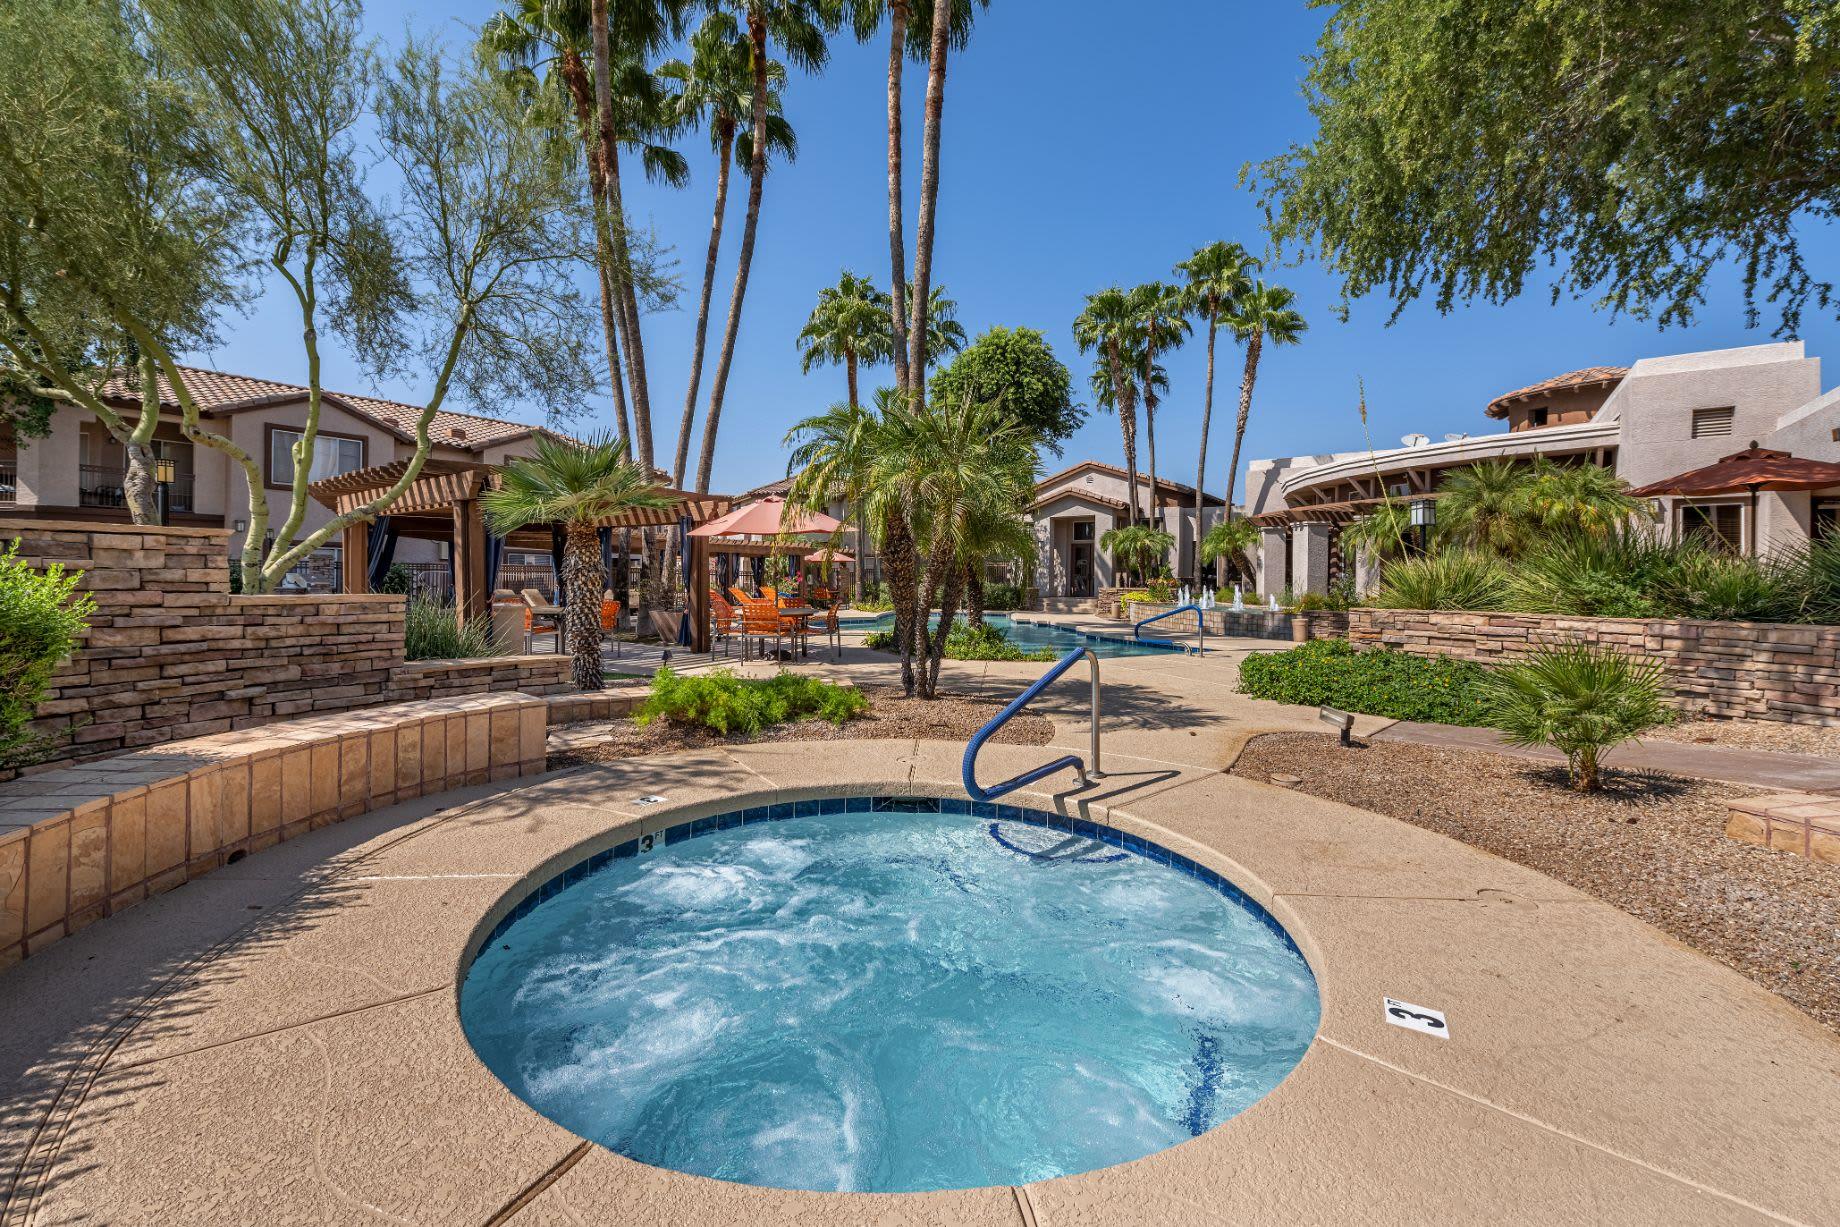 Outdoor spa near resort style pool at Azure Creek in Cave Creek, Arizona